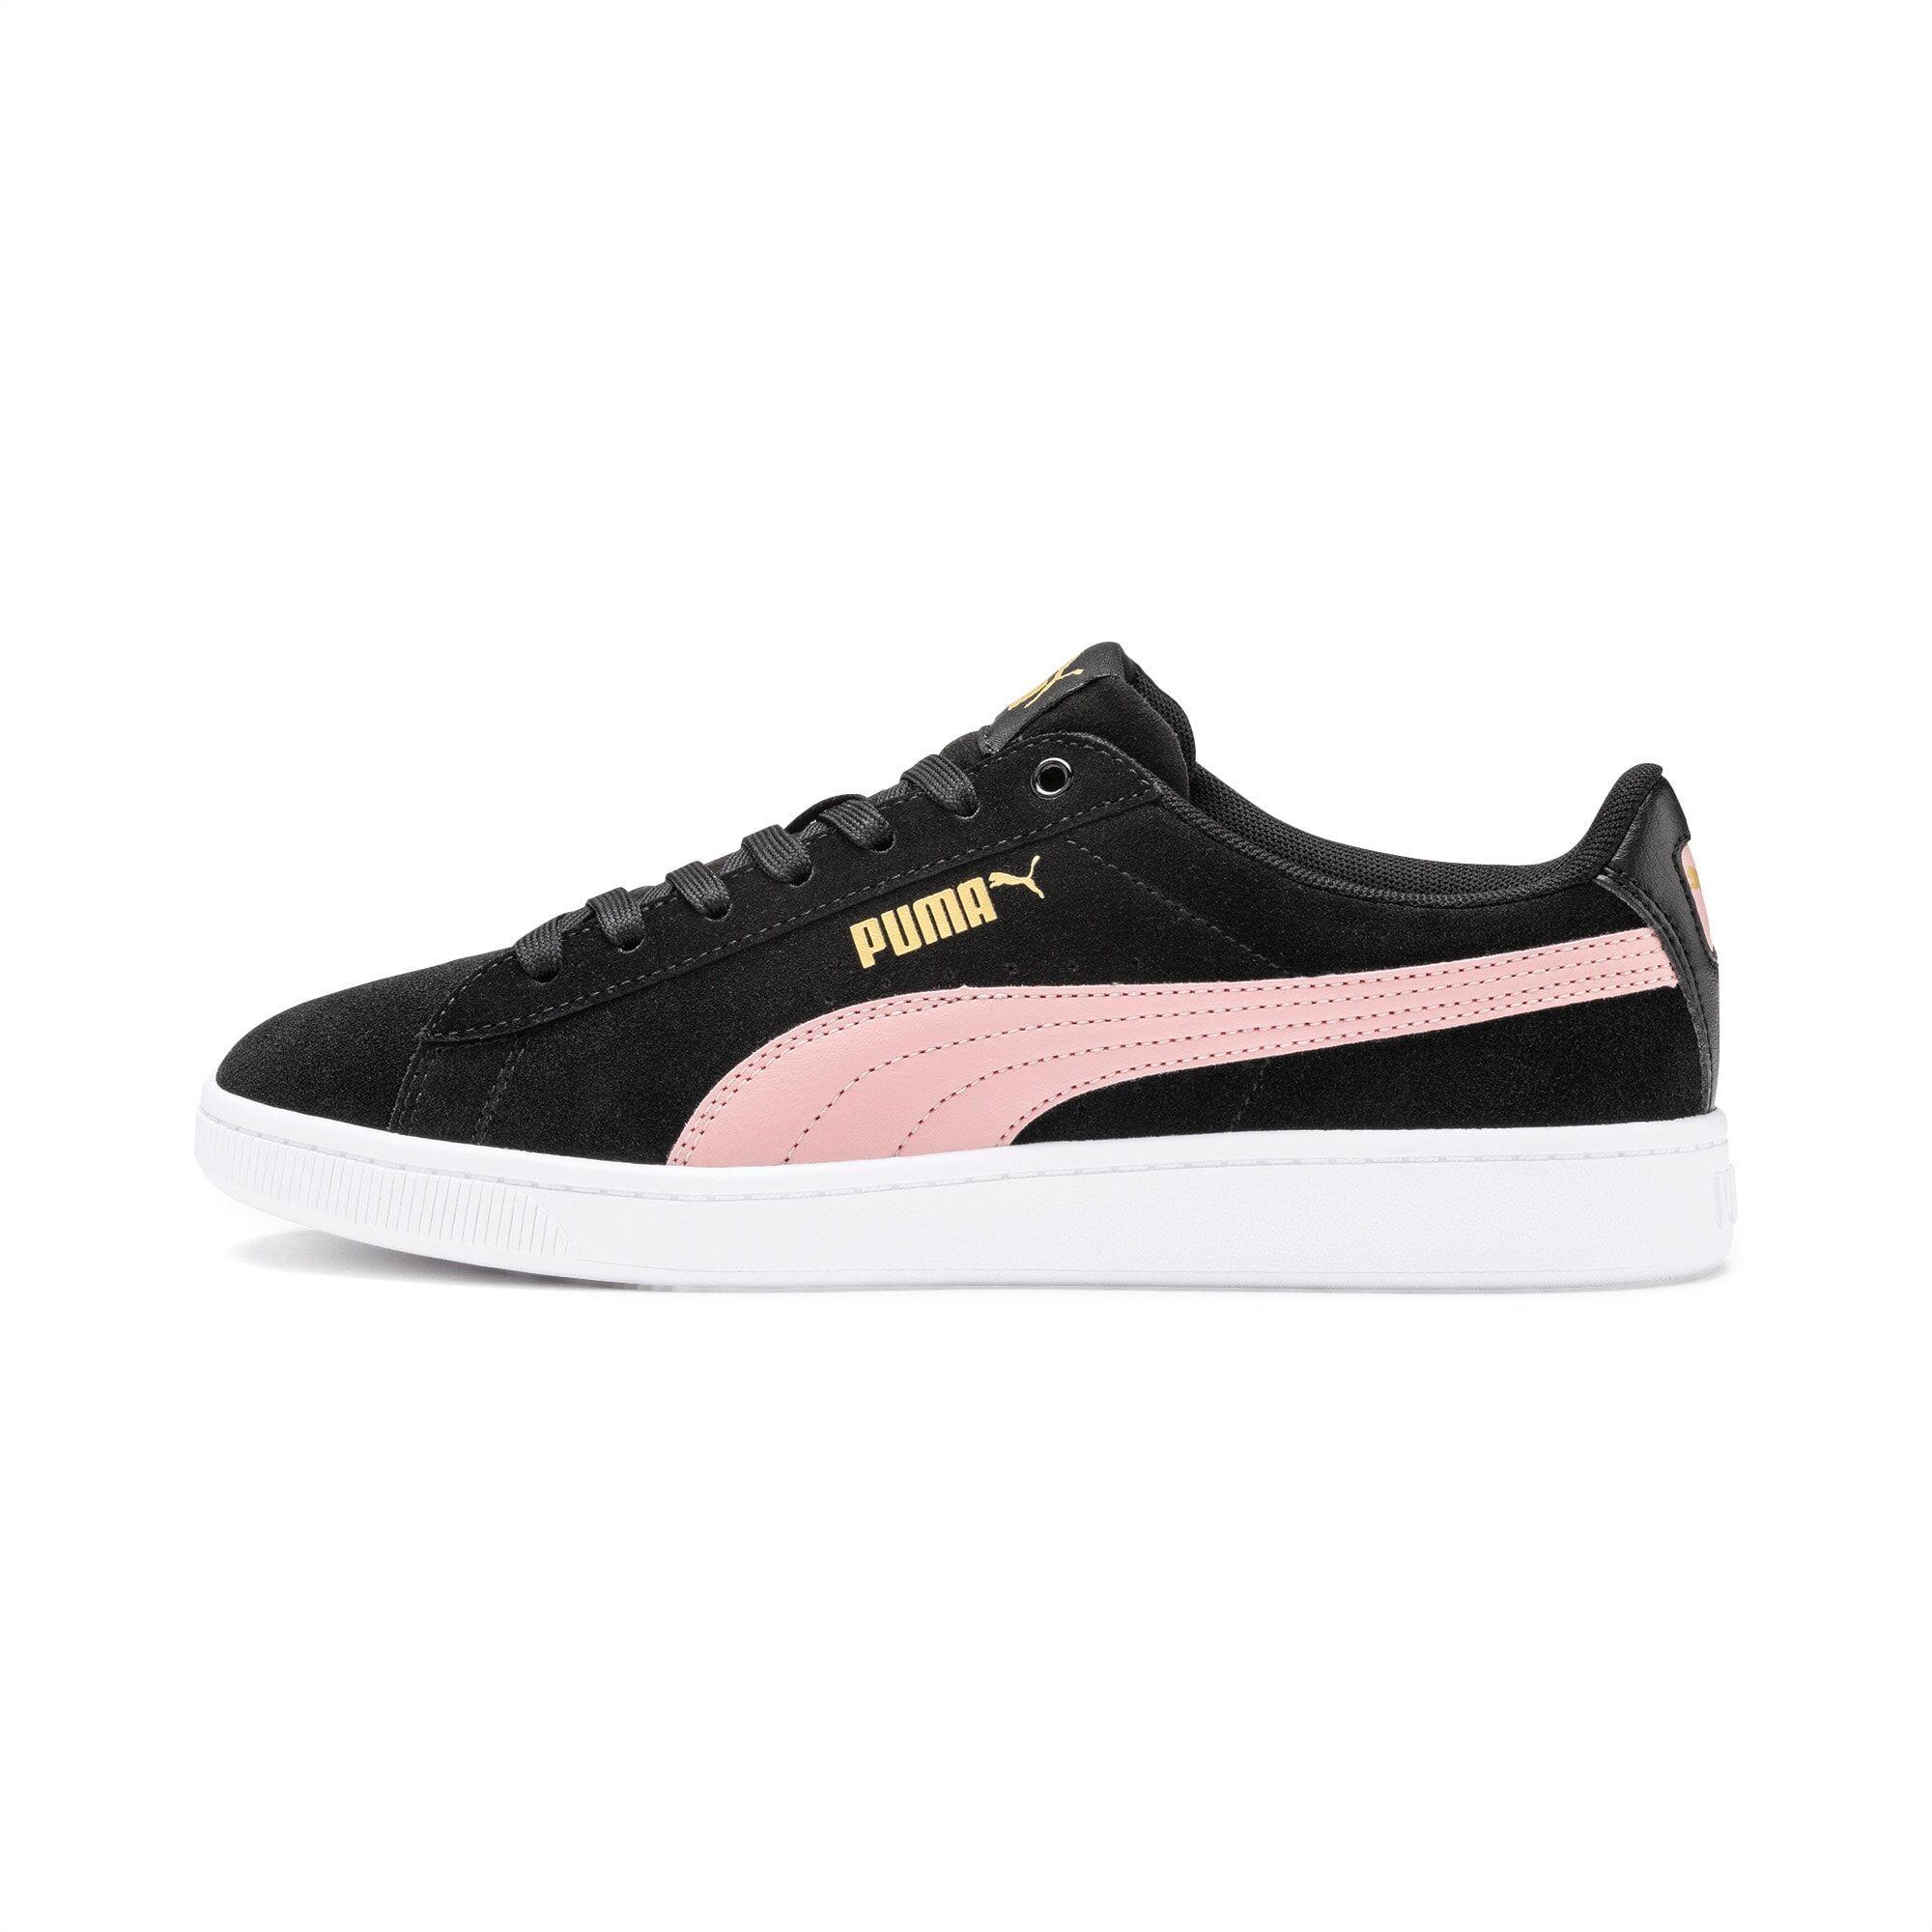 PUMA Chaussure Basket Vikky v2 pour Femme, Blanc/Rose/Noir, Taille 41, Chaussures